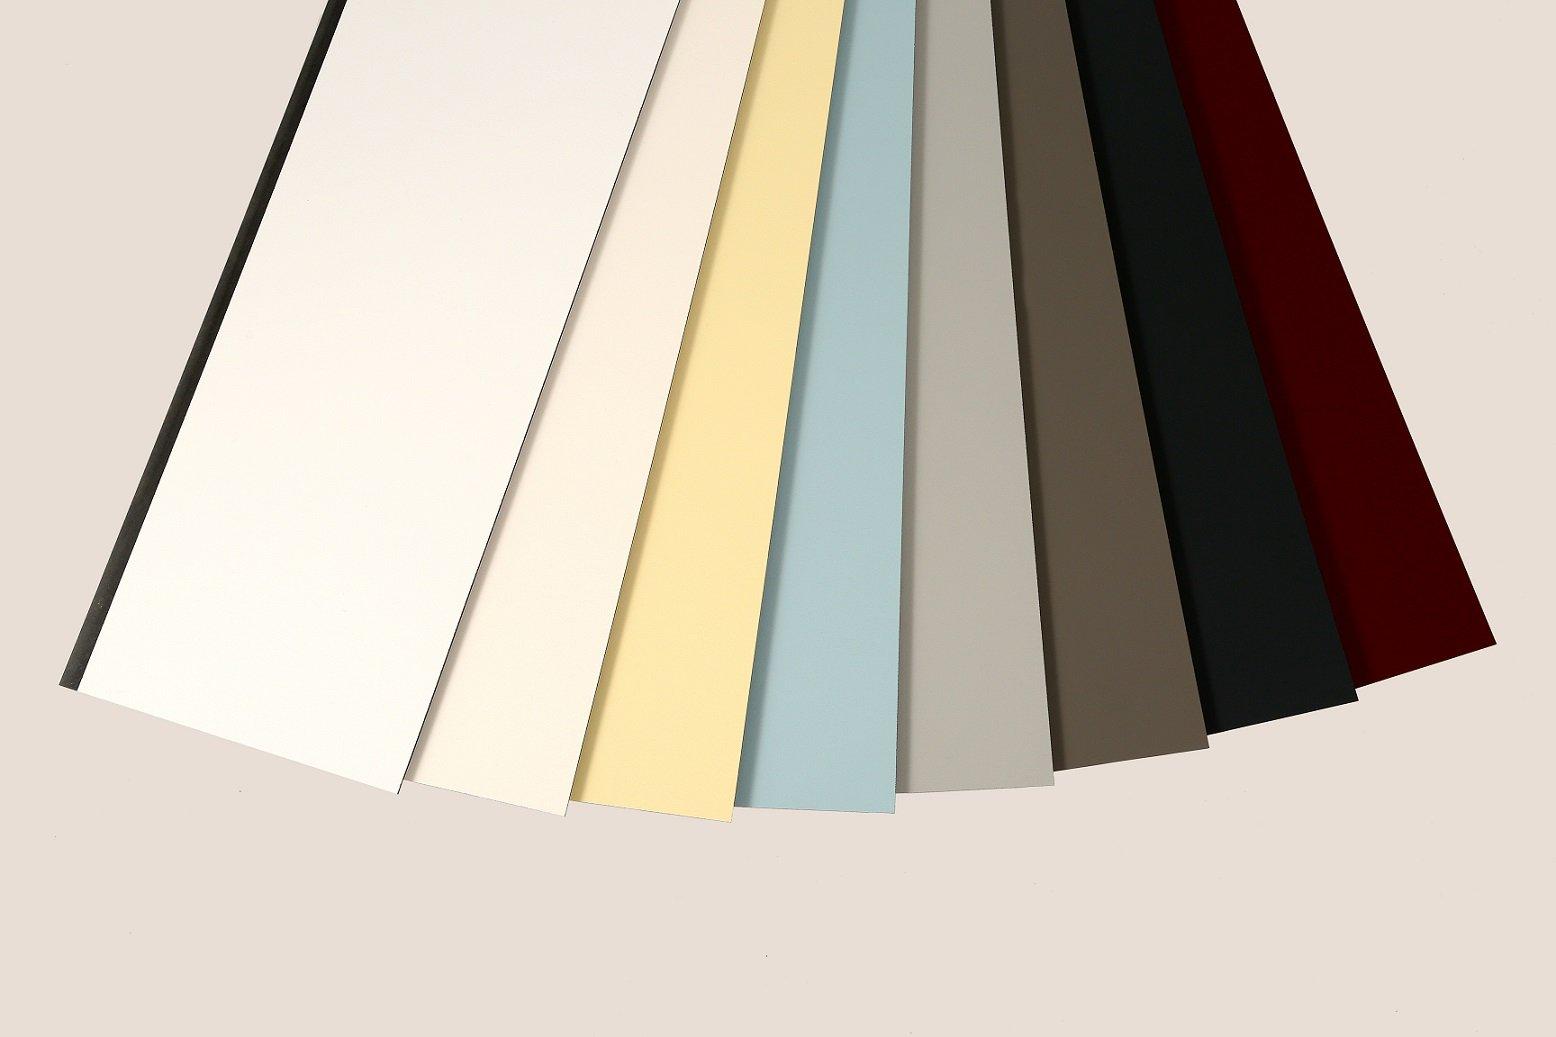 Trespa Pura Uni Colours trespa siding colors